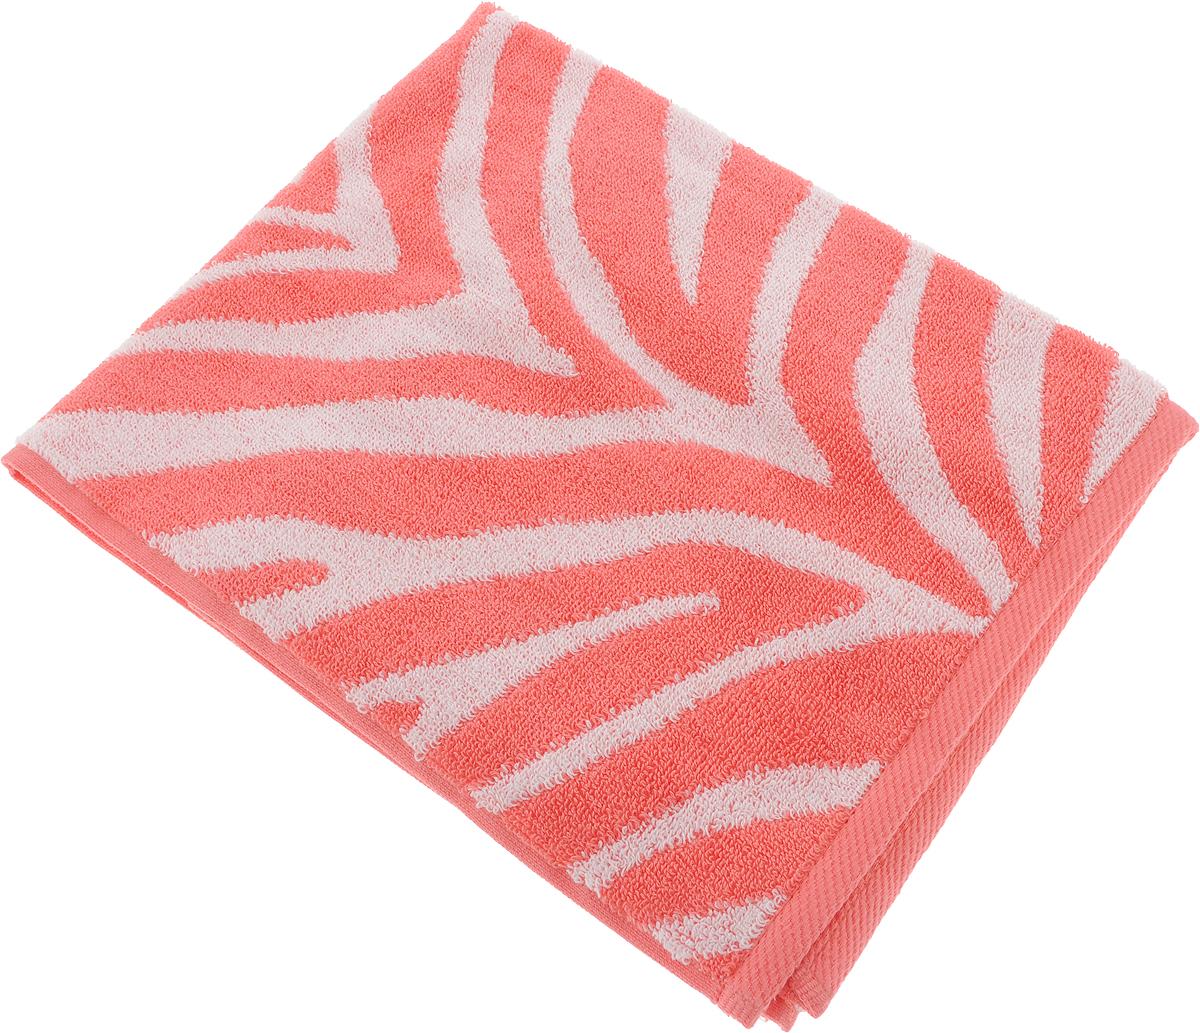 Полотенце Aquarelle Мадагаскар. Зебра, цвет: белый, коралловый, 50 х 90 см полотенце махровое aquarelle таллин 1 цвет ваниль 50 х 90 см 707762